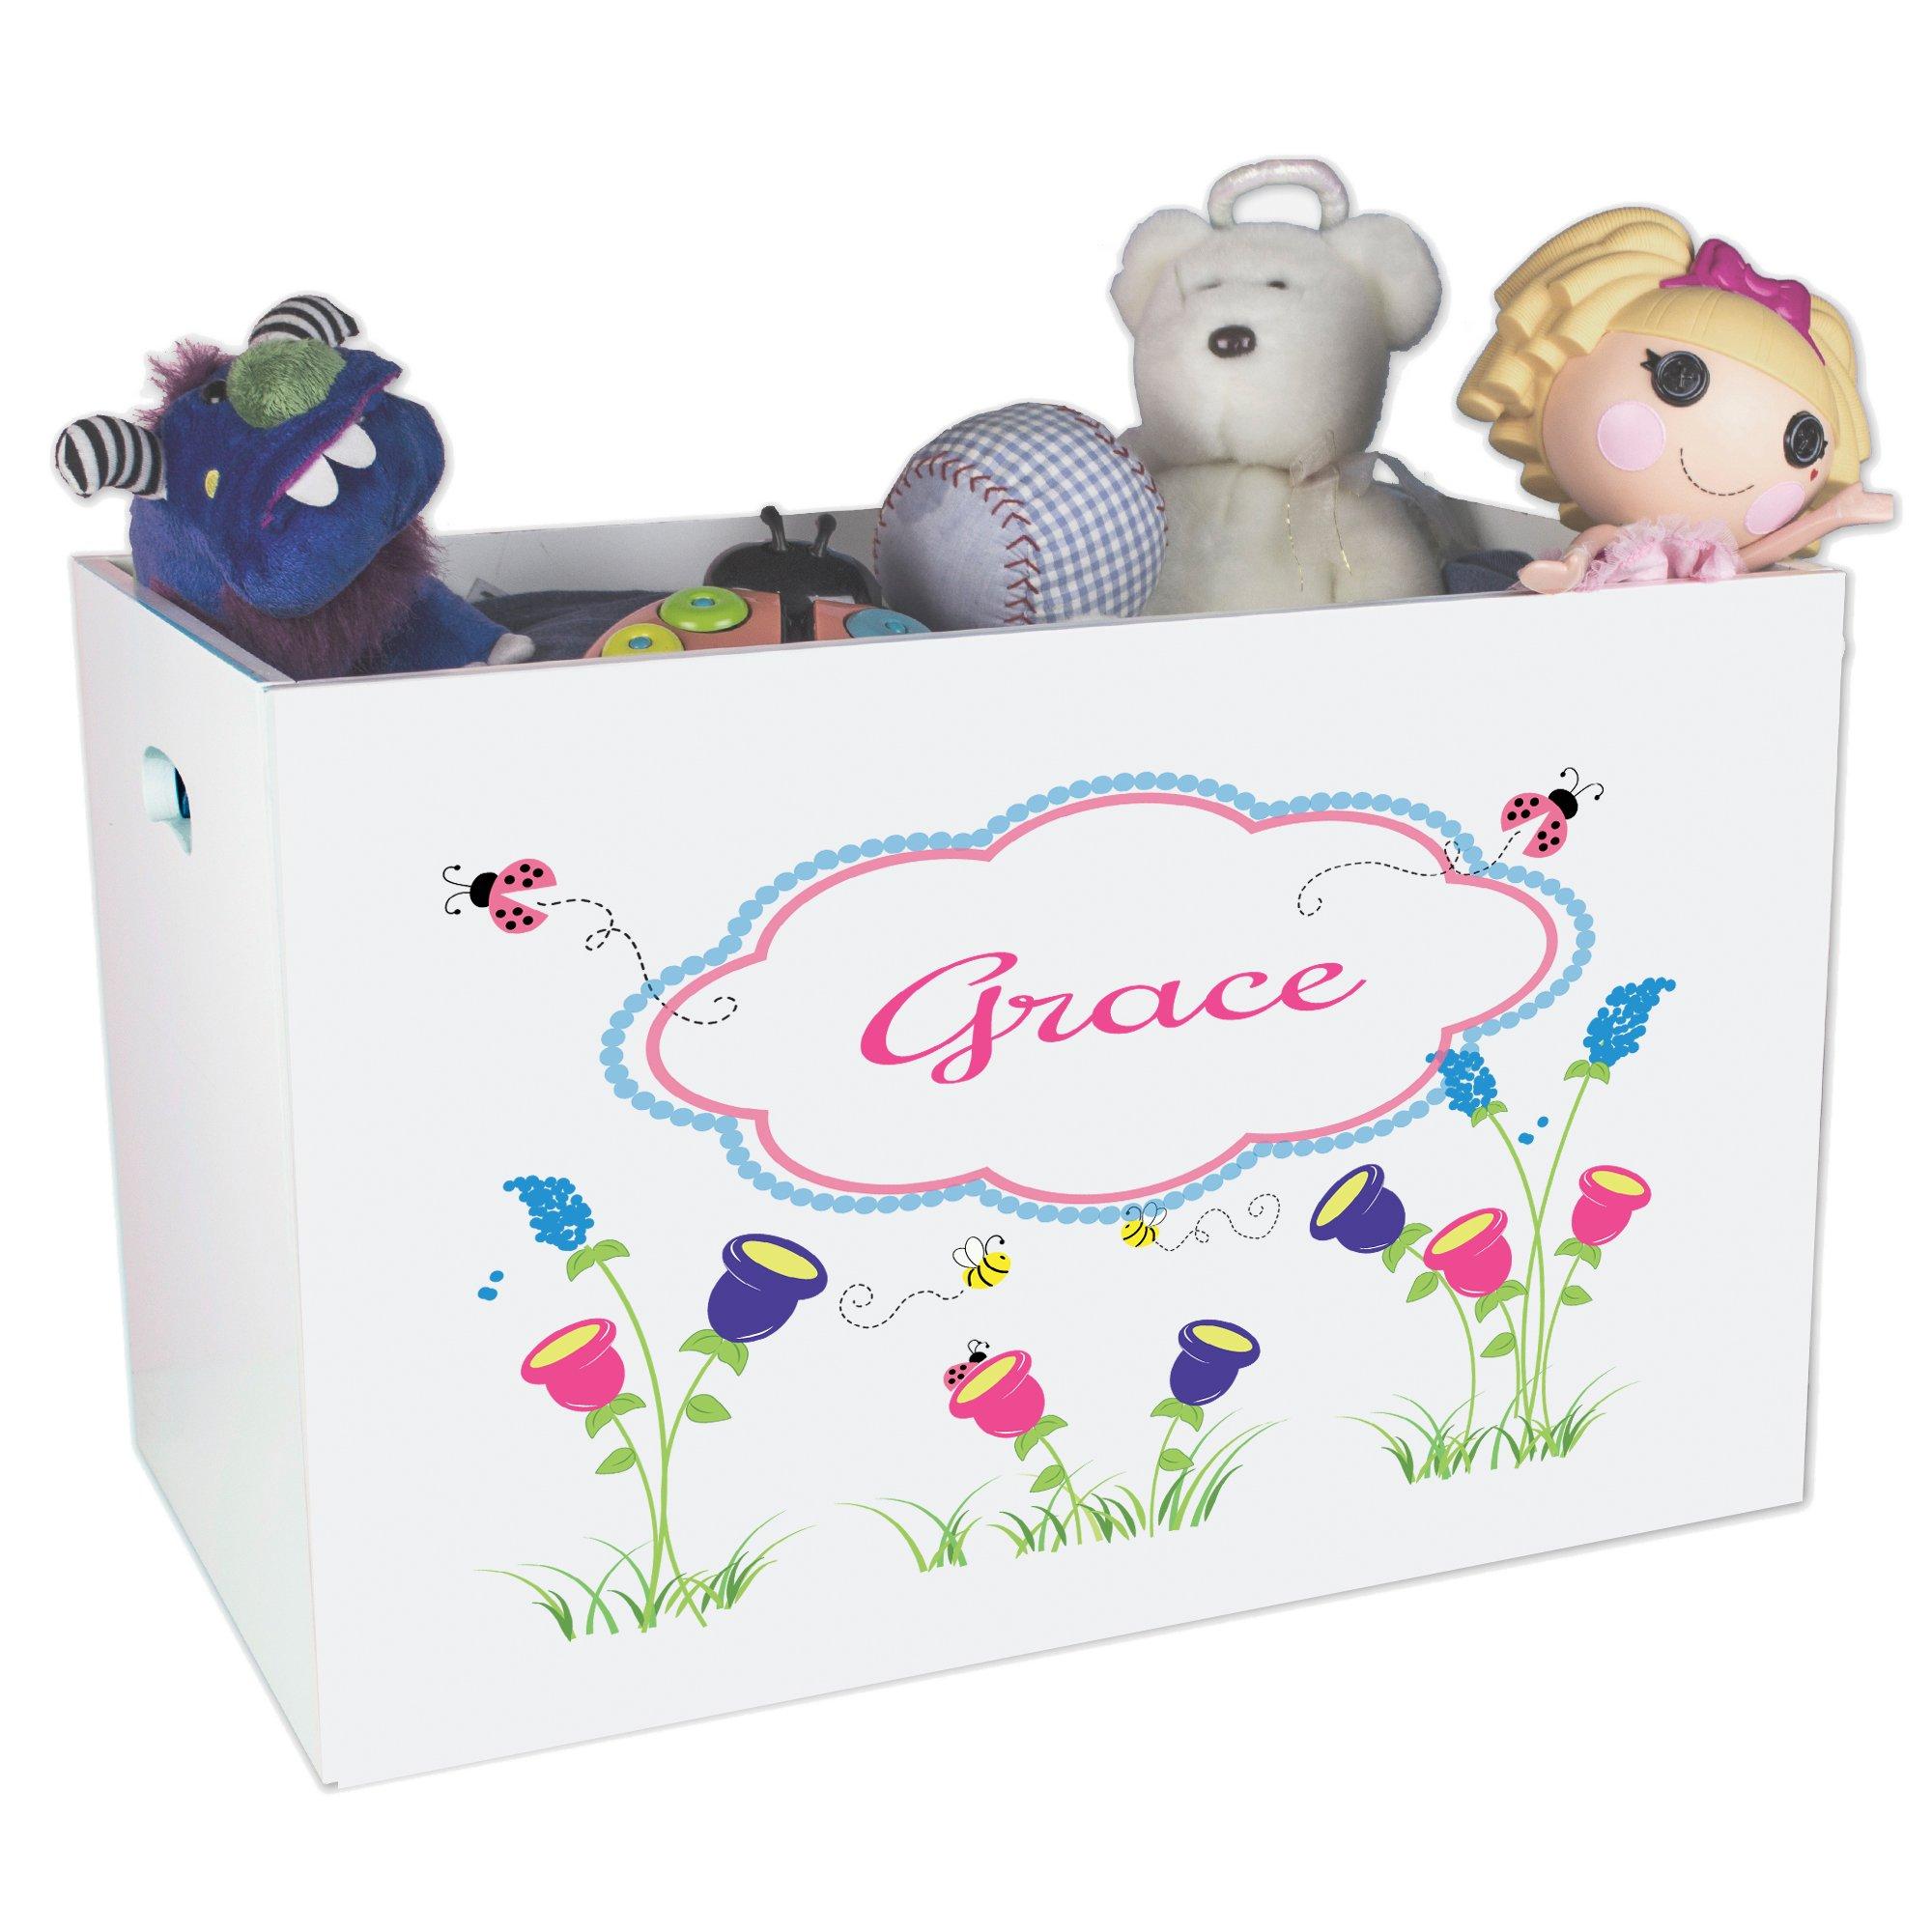 Personalized Garden Childrens Nursery White Open Toy Box